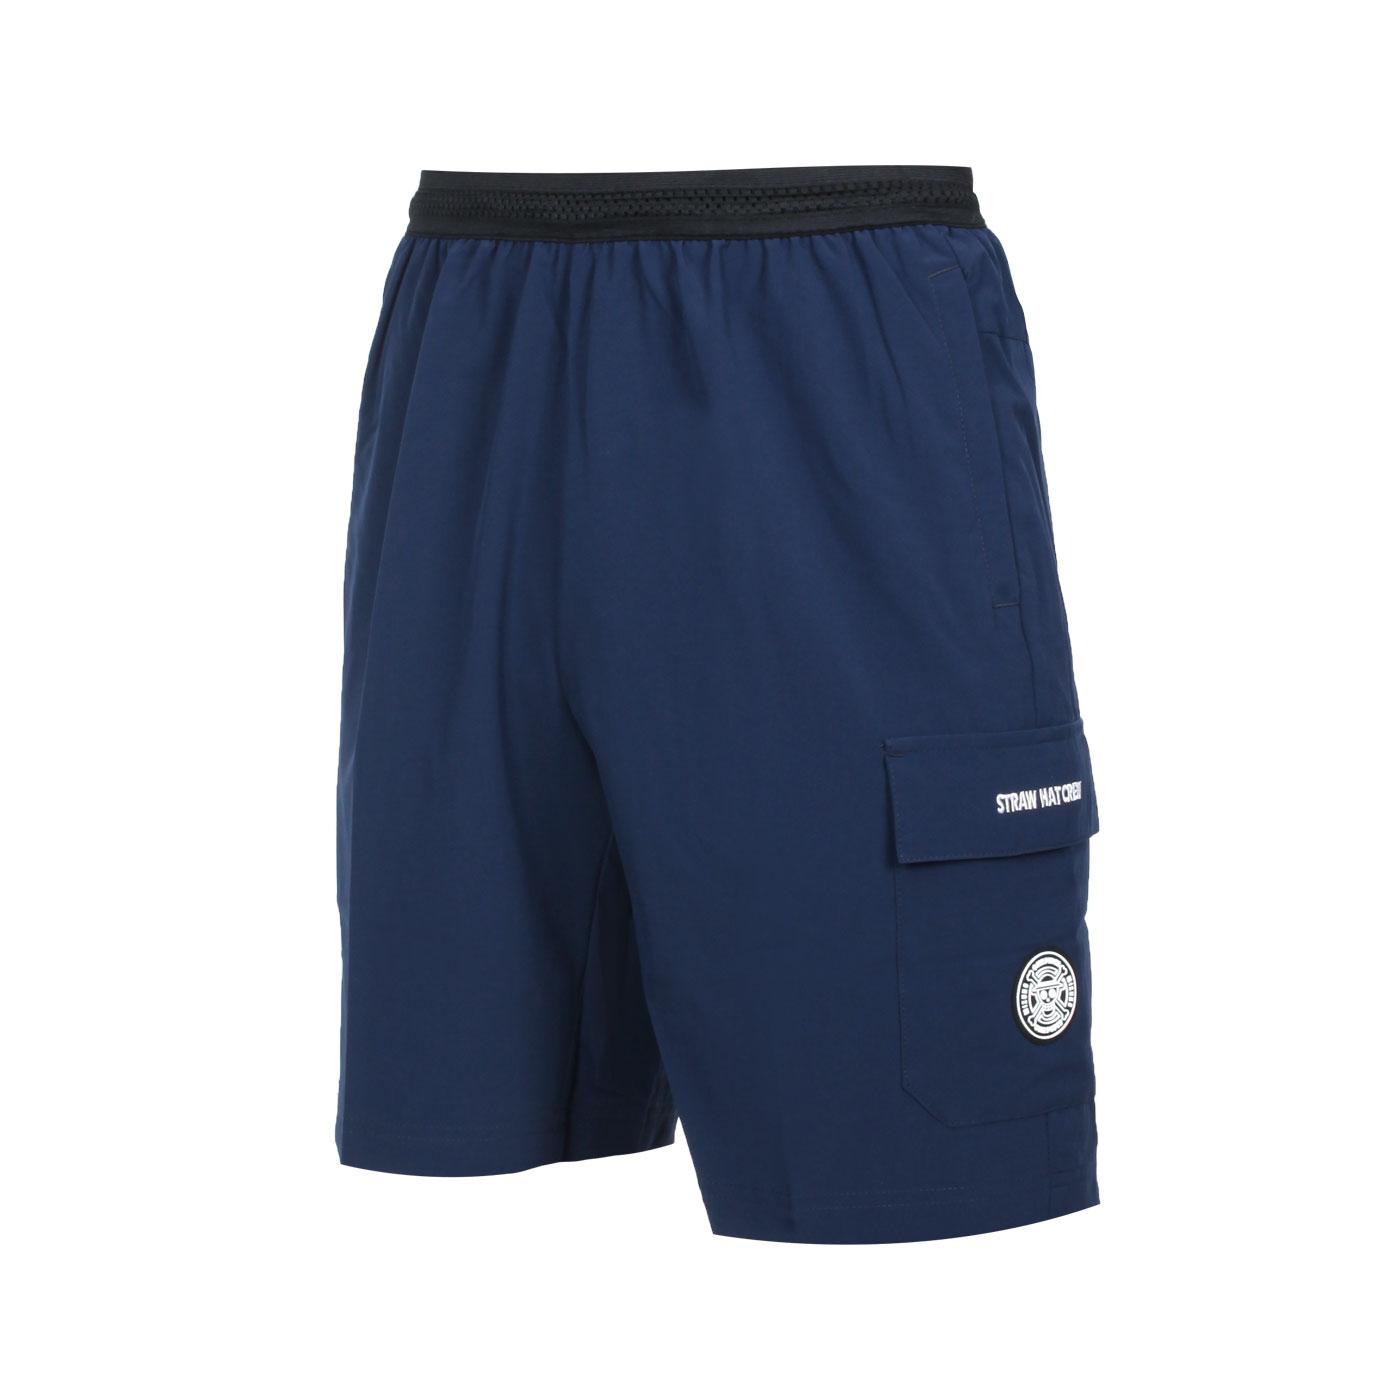 MIZUNO 男平織短褲(海賊王聯名款) D2TB155714